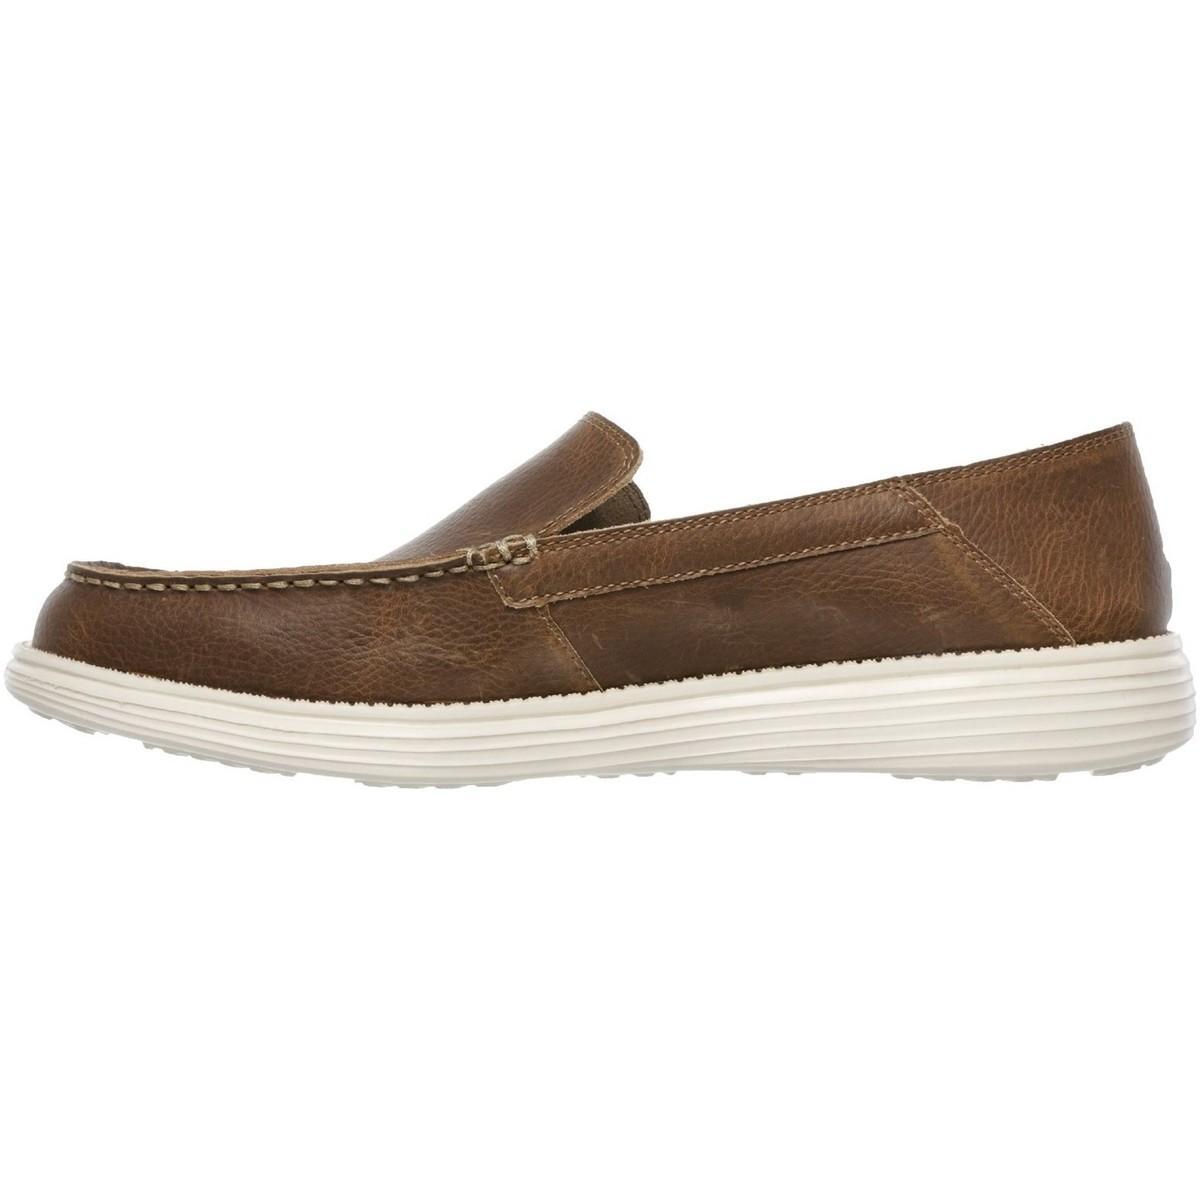 Skechers Homme Status Breson Casual Shoes Semelle